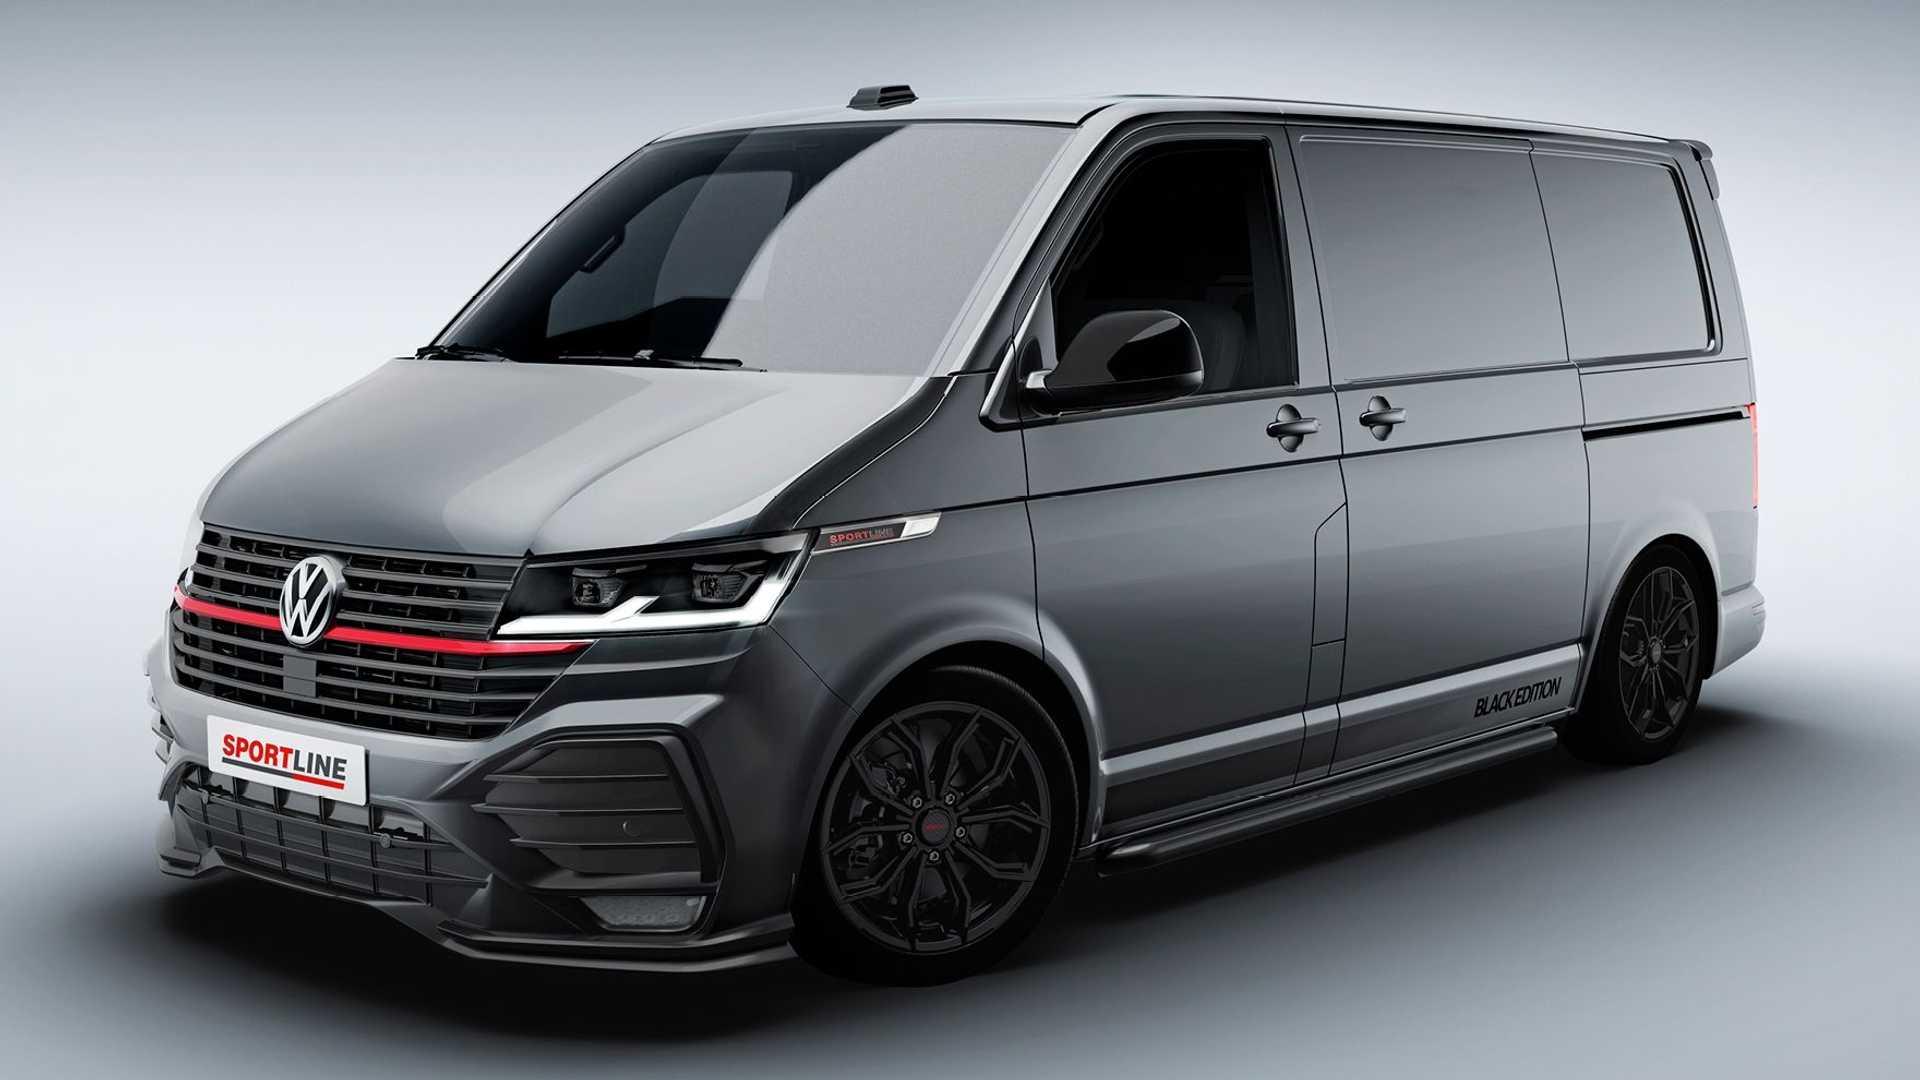 Volkswagen презентовал спортивный фургон TransporterSportline 1